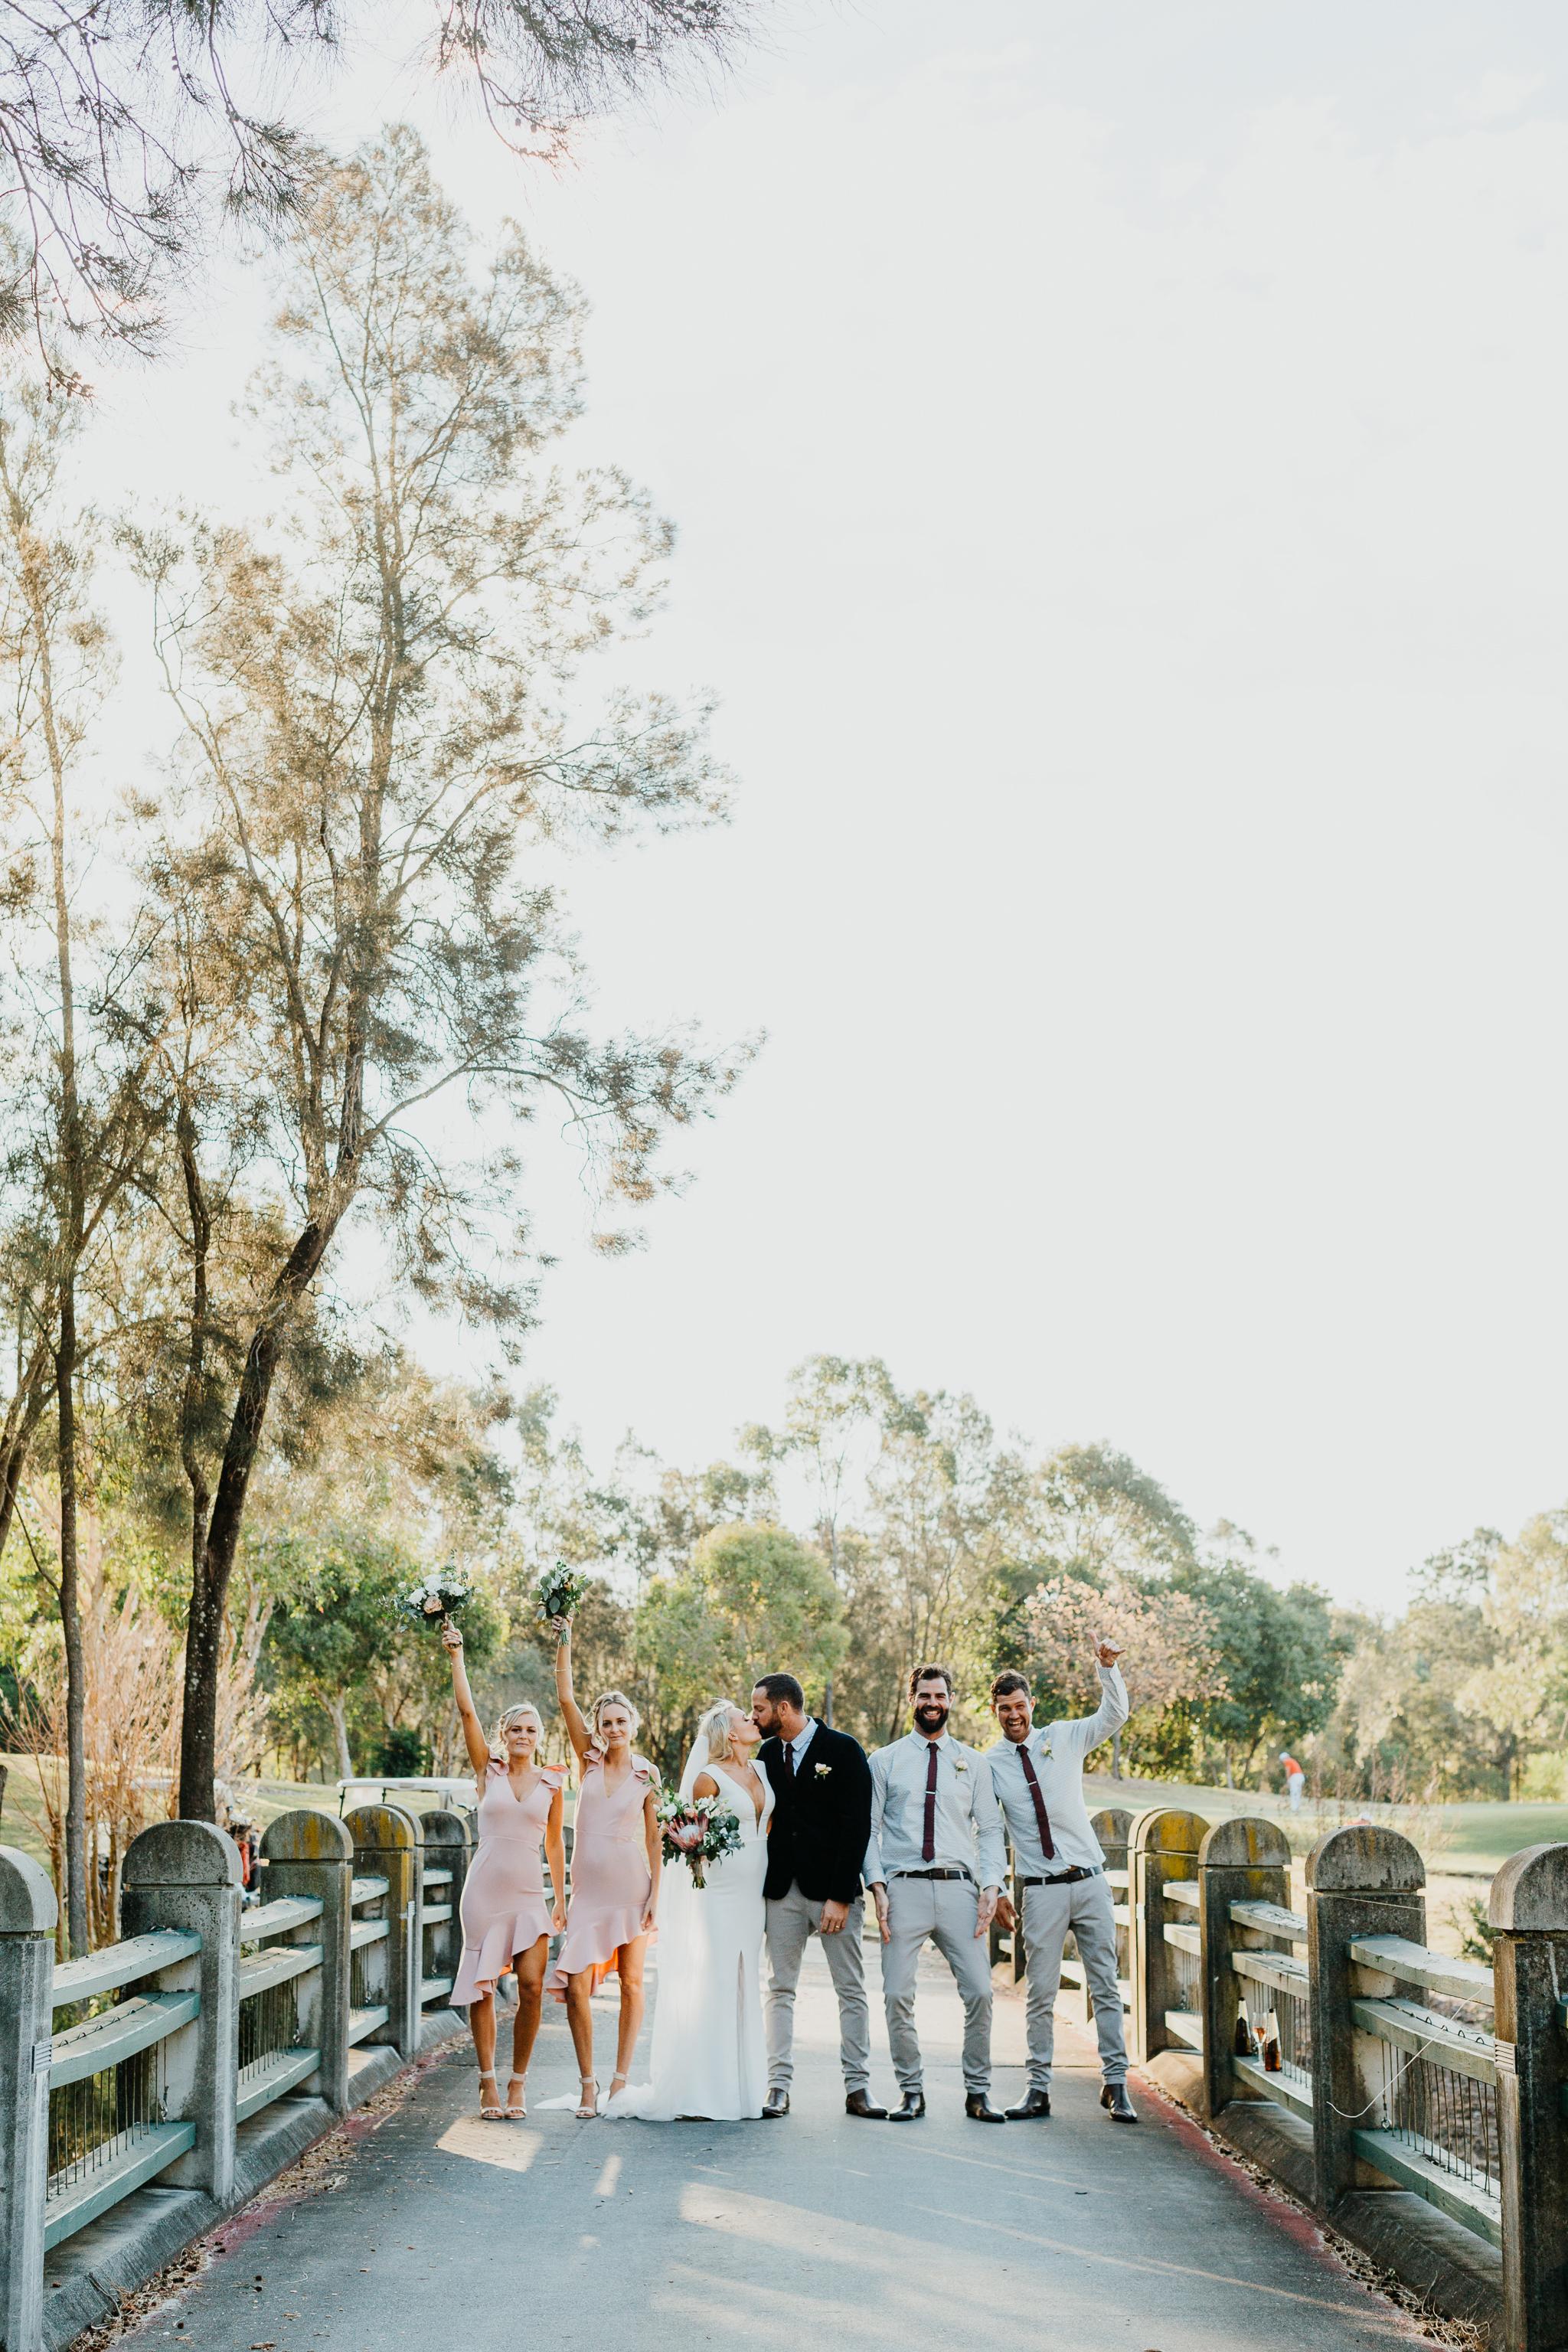 Anna & Logan - Lakelands Golf Course Wedding-286.jpg